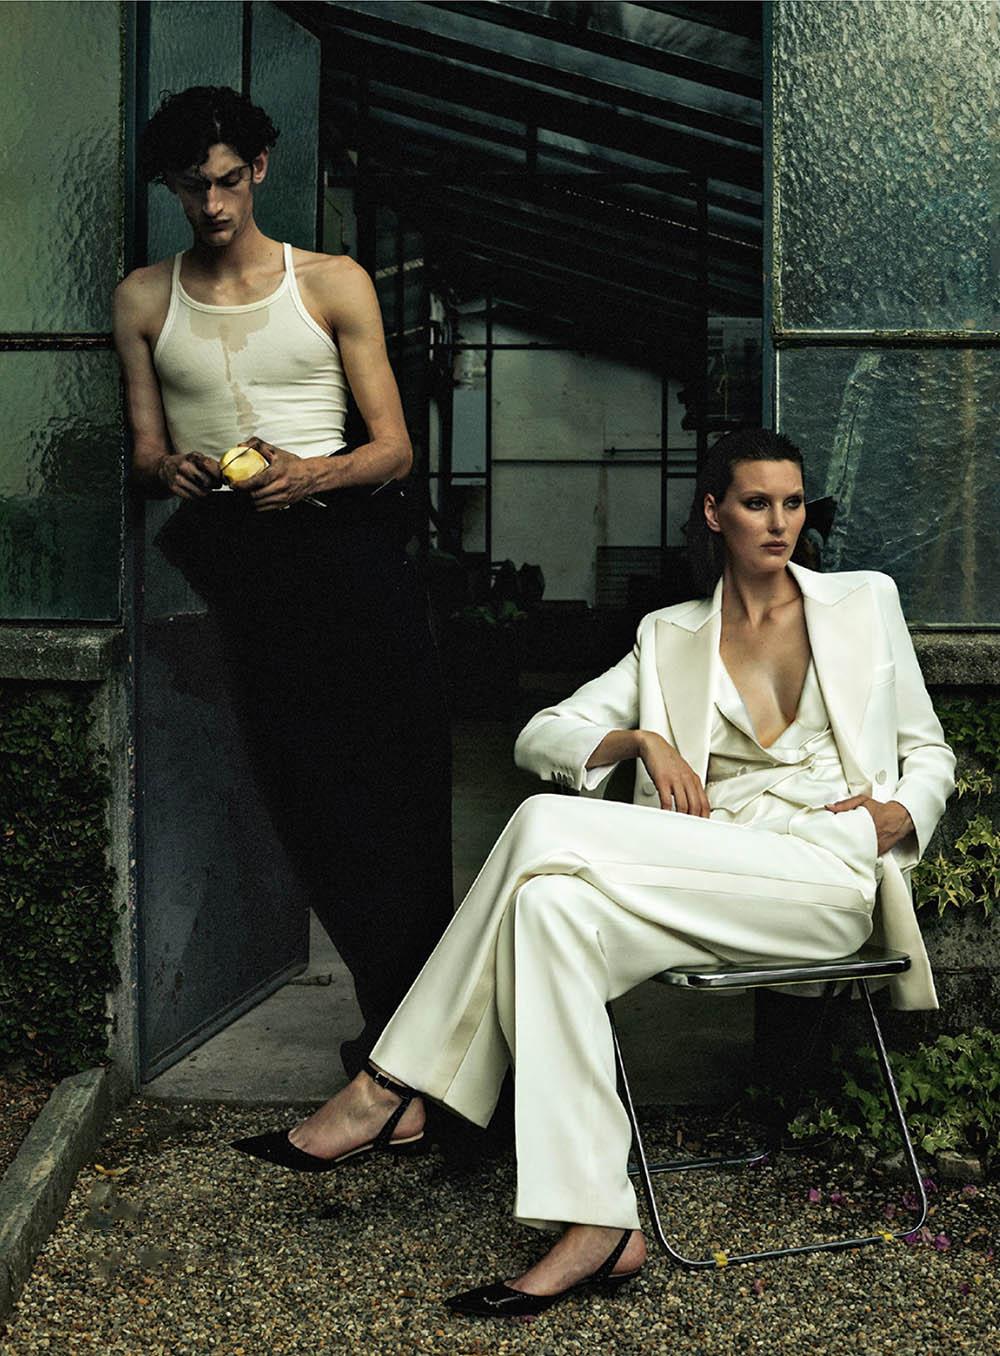 Aaron Shandel and Veroniek Gielkens by Stephan Lisowski for Harper's Bazaar Netherlands November 2019